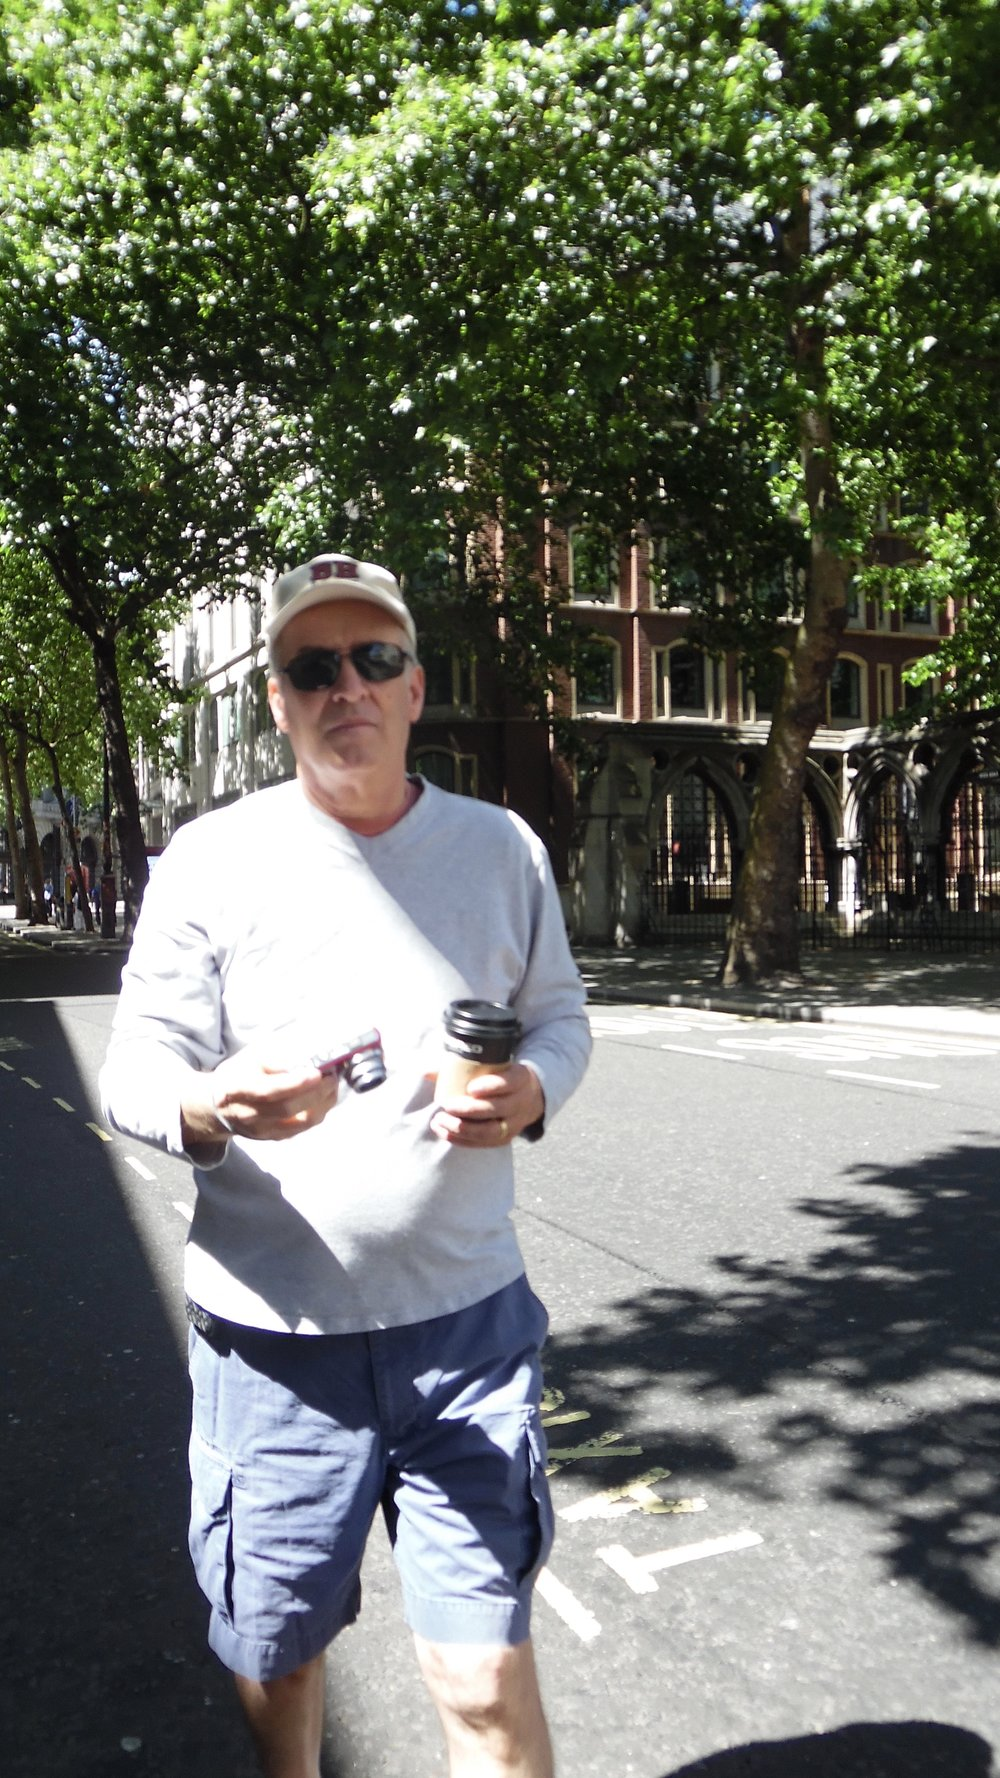 My favorite tourist